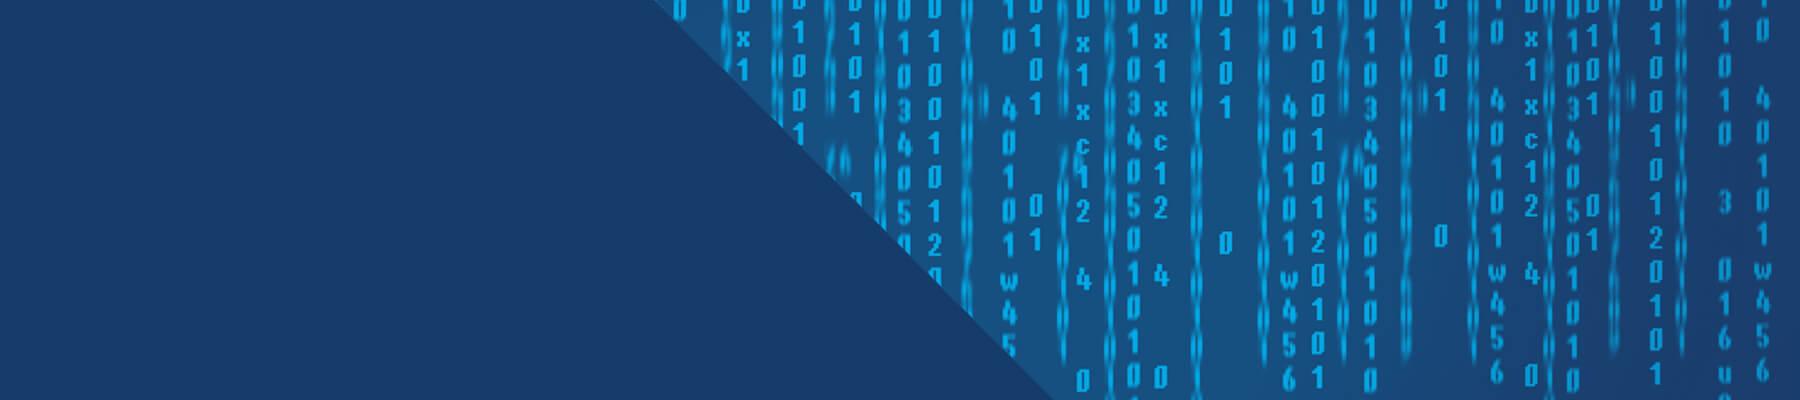 Cyber Management Alliance Banner